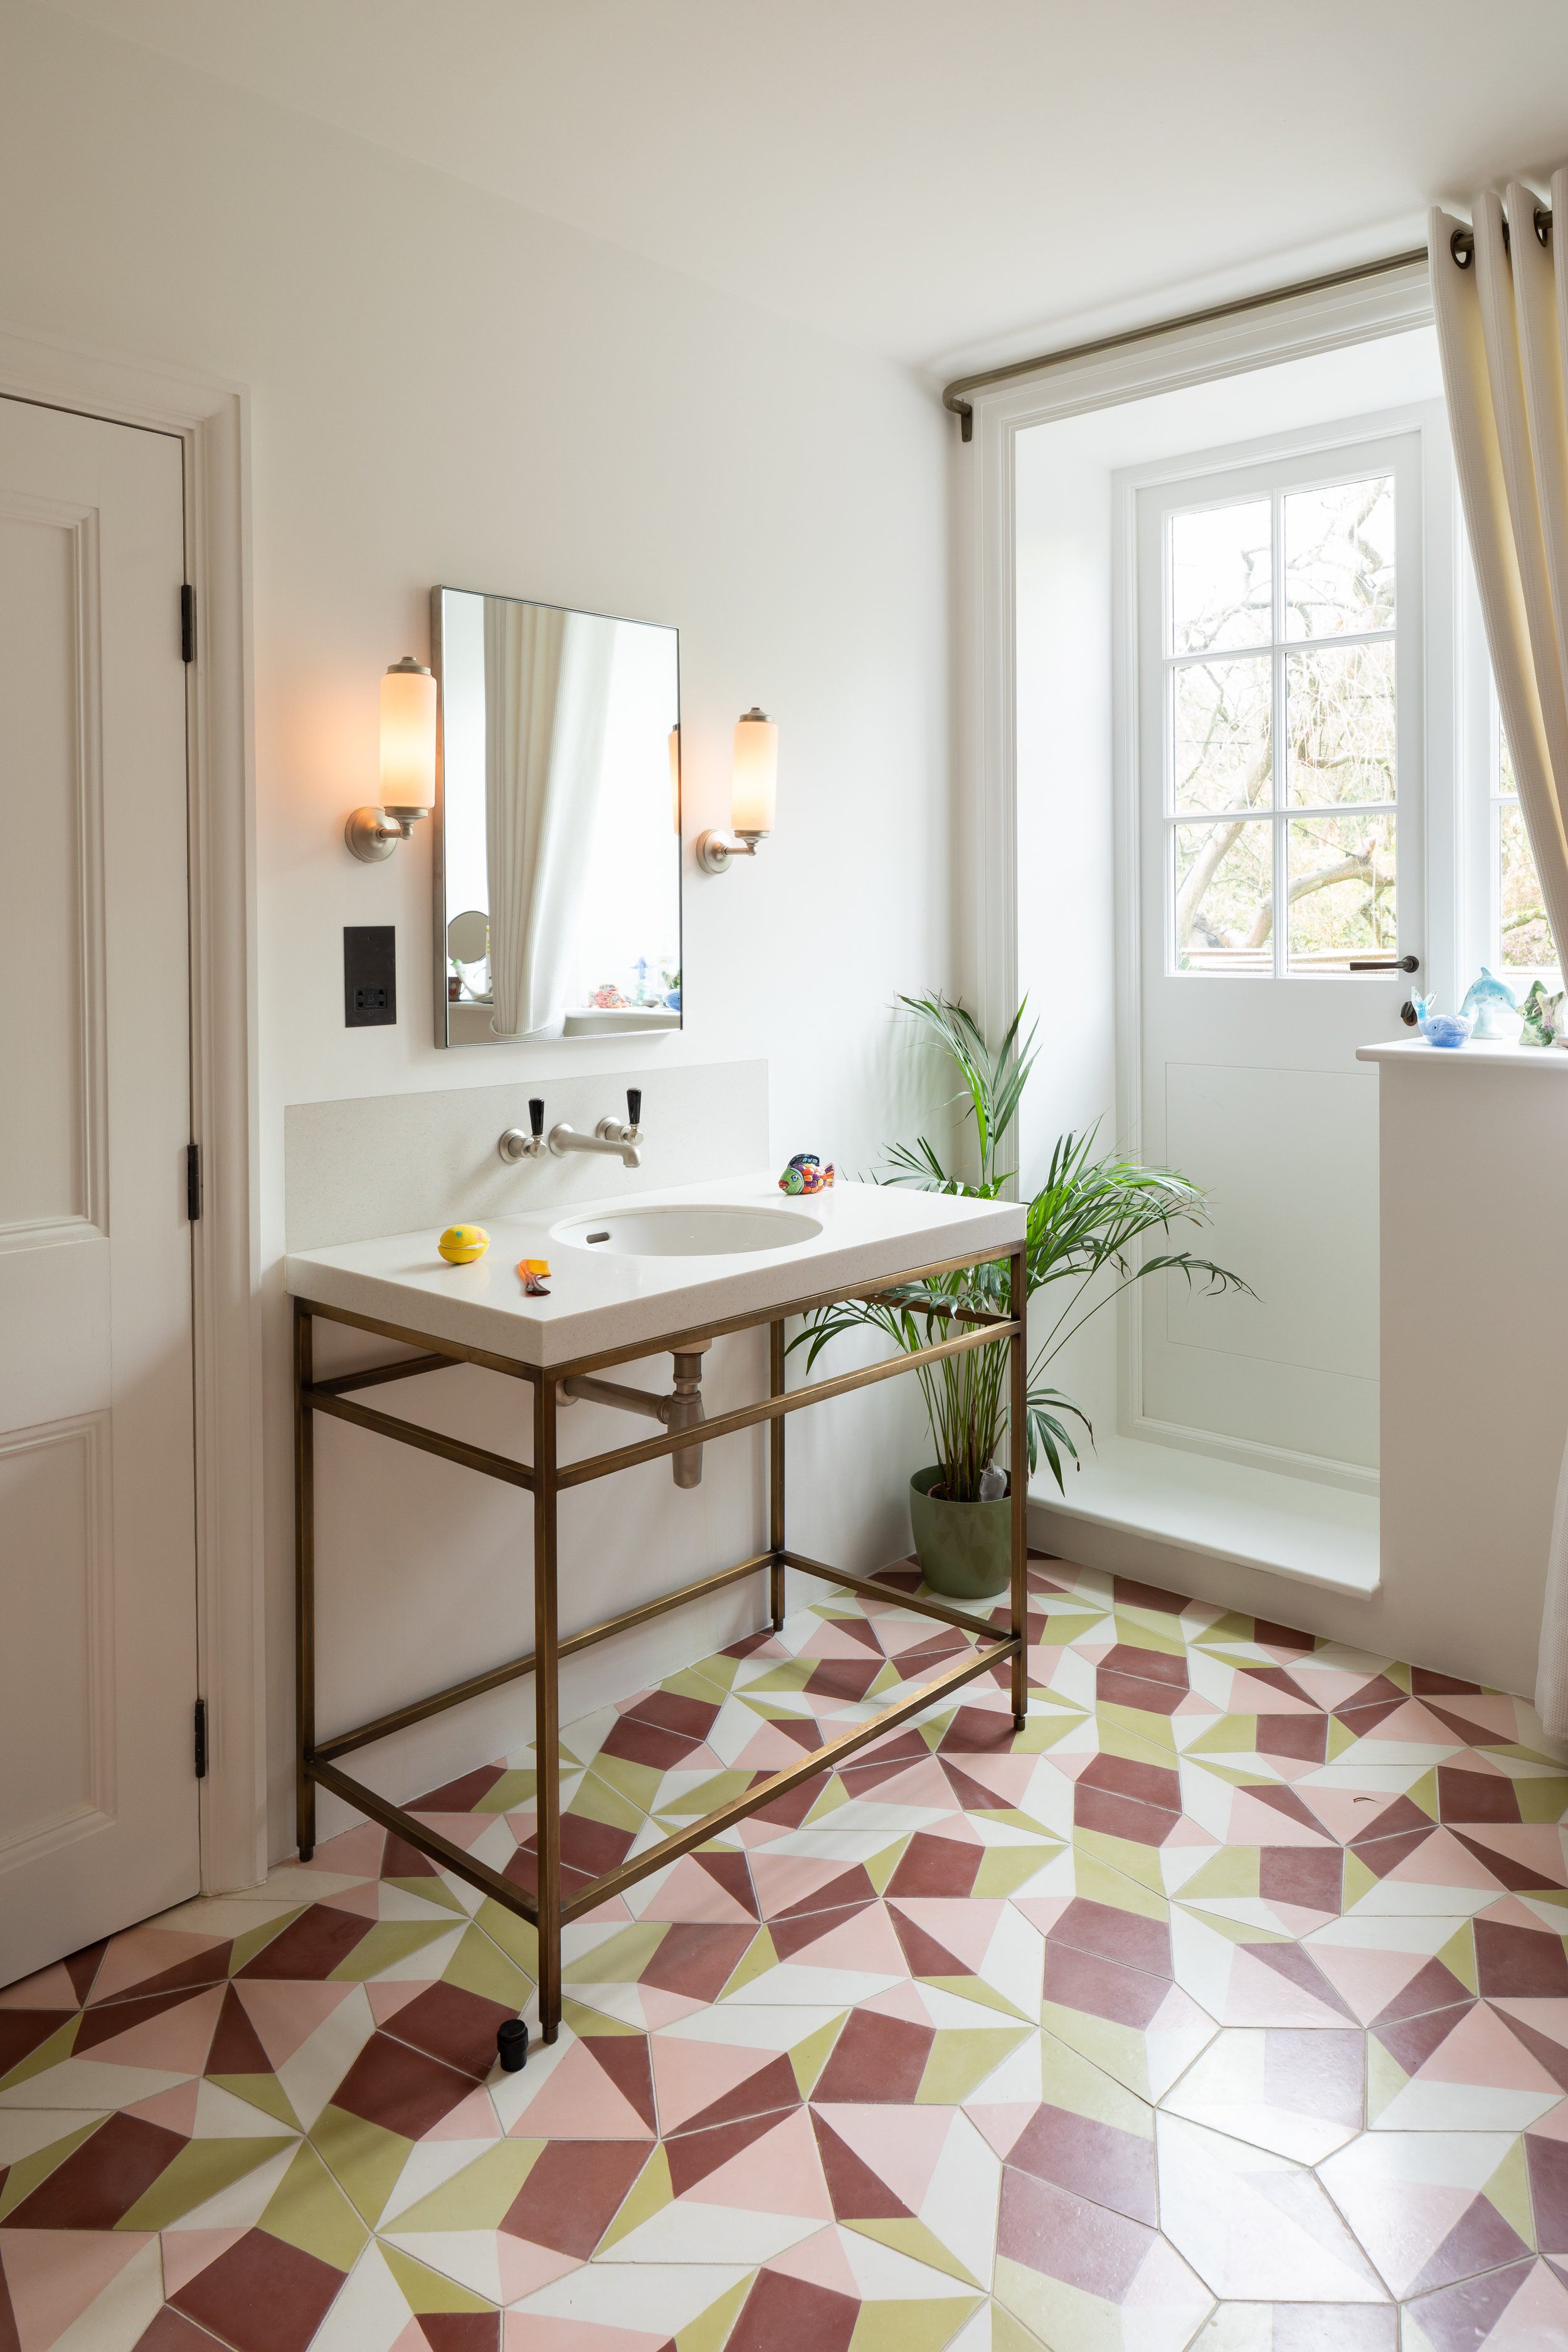 The Cheshire Bathroom